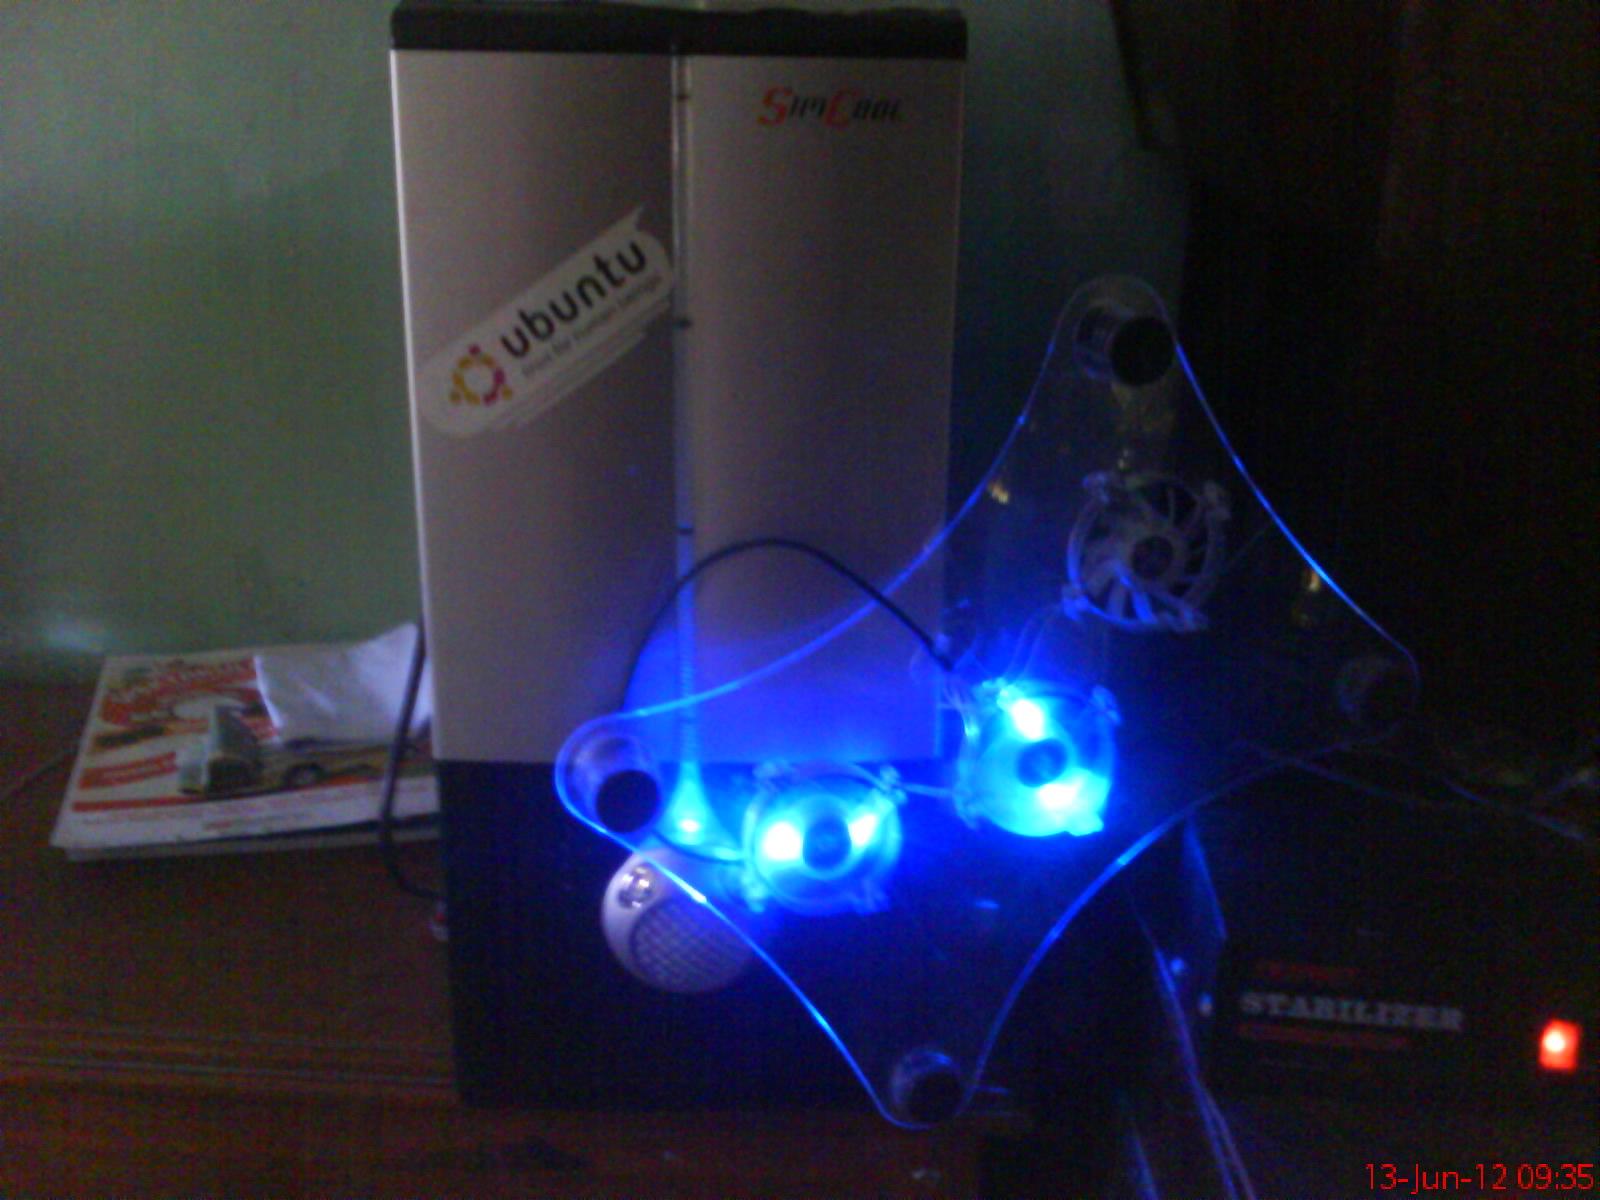 pendingin modem smartfren